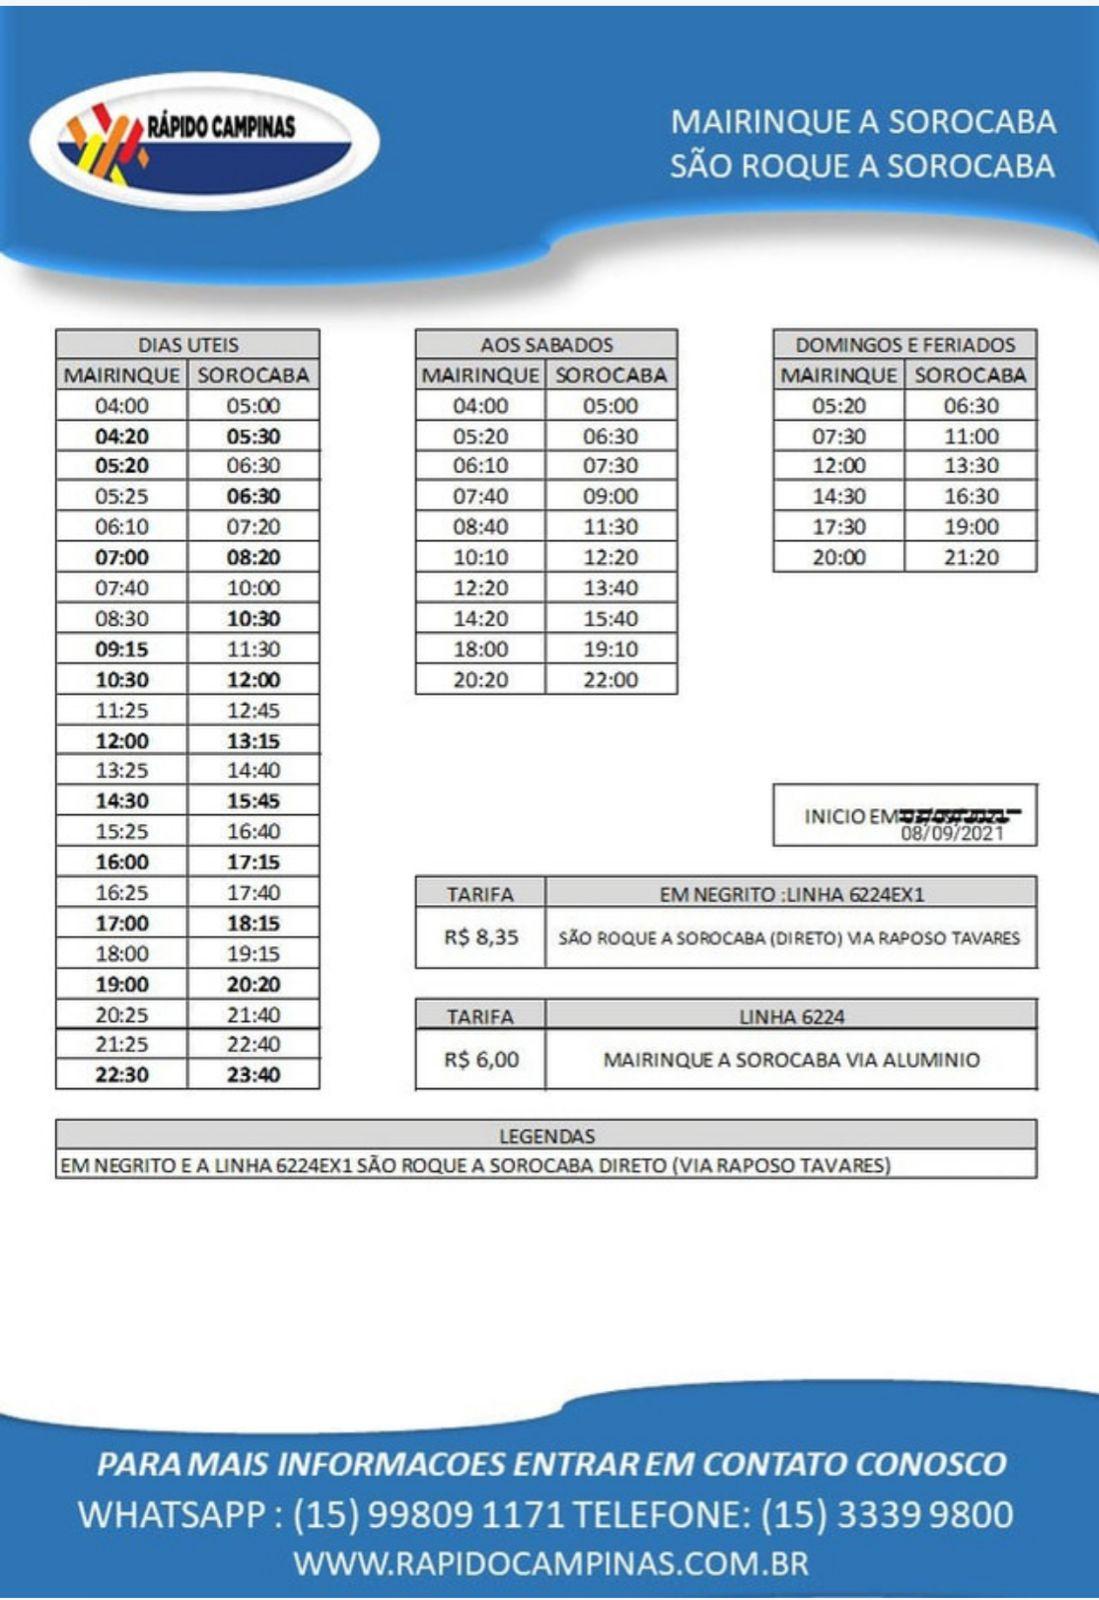 RAPIDO CAMPINAS 08-09-2021 mairinque a sorocaba - sao roque a sorocaba